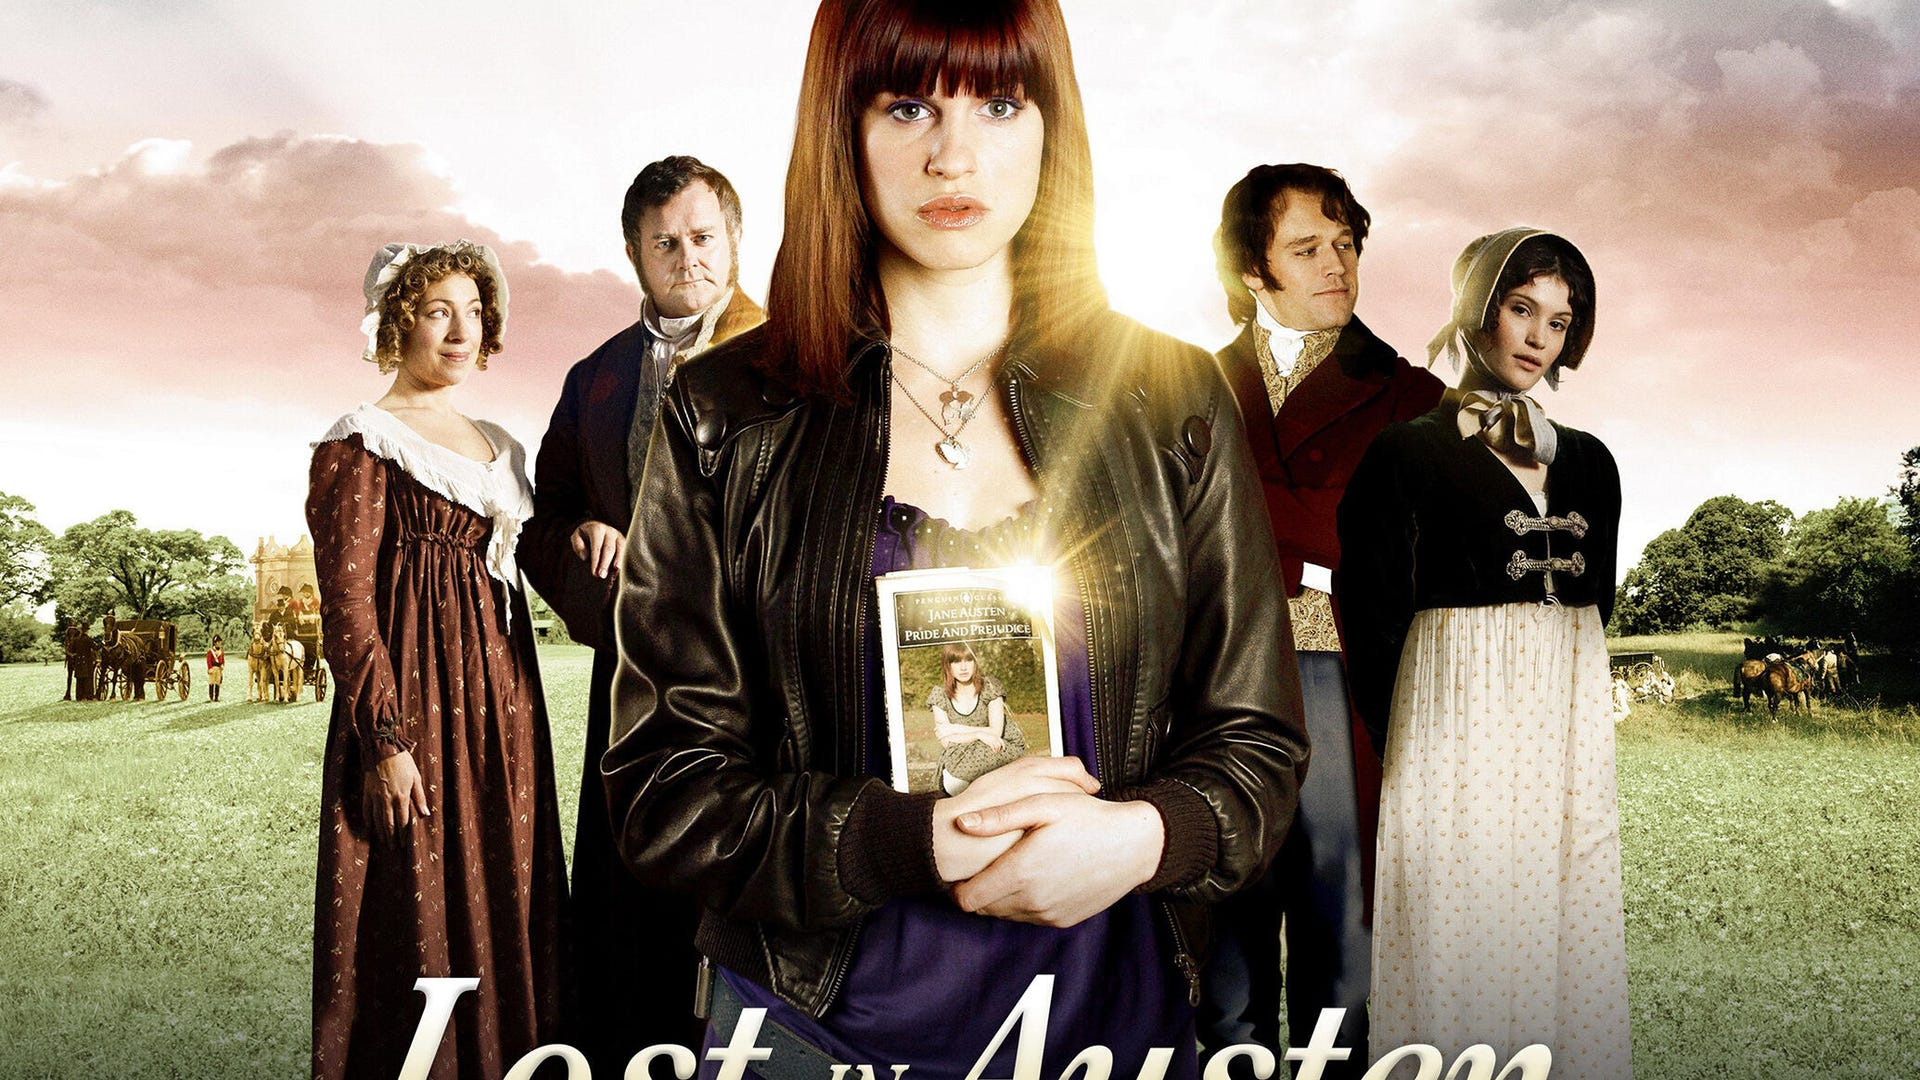 Jemima Rooper, Elliot Cowan, Alex Kingston, Morvne Christie, and Hugh Bonneville, Lost in Austen